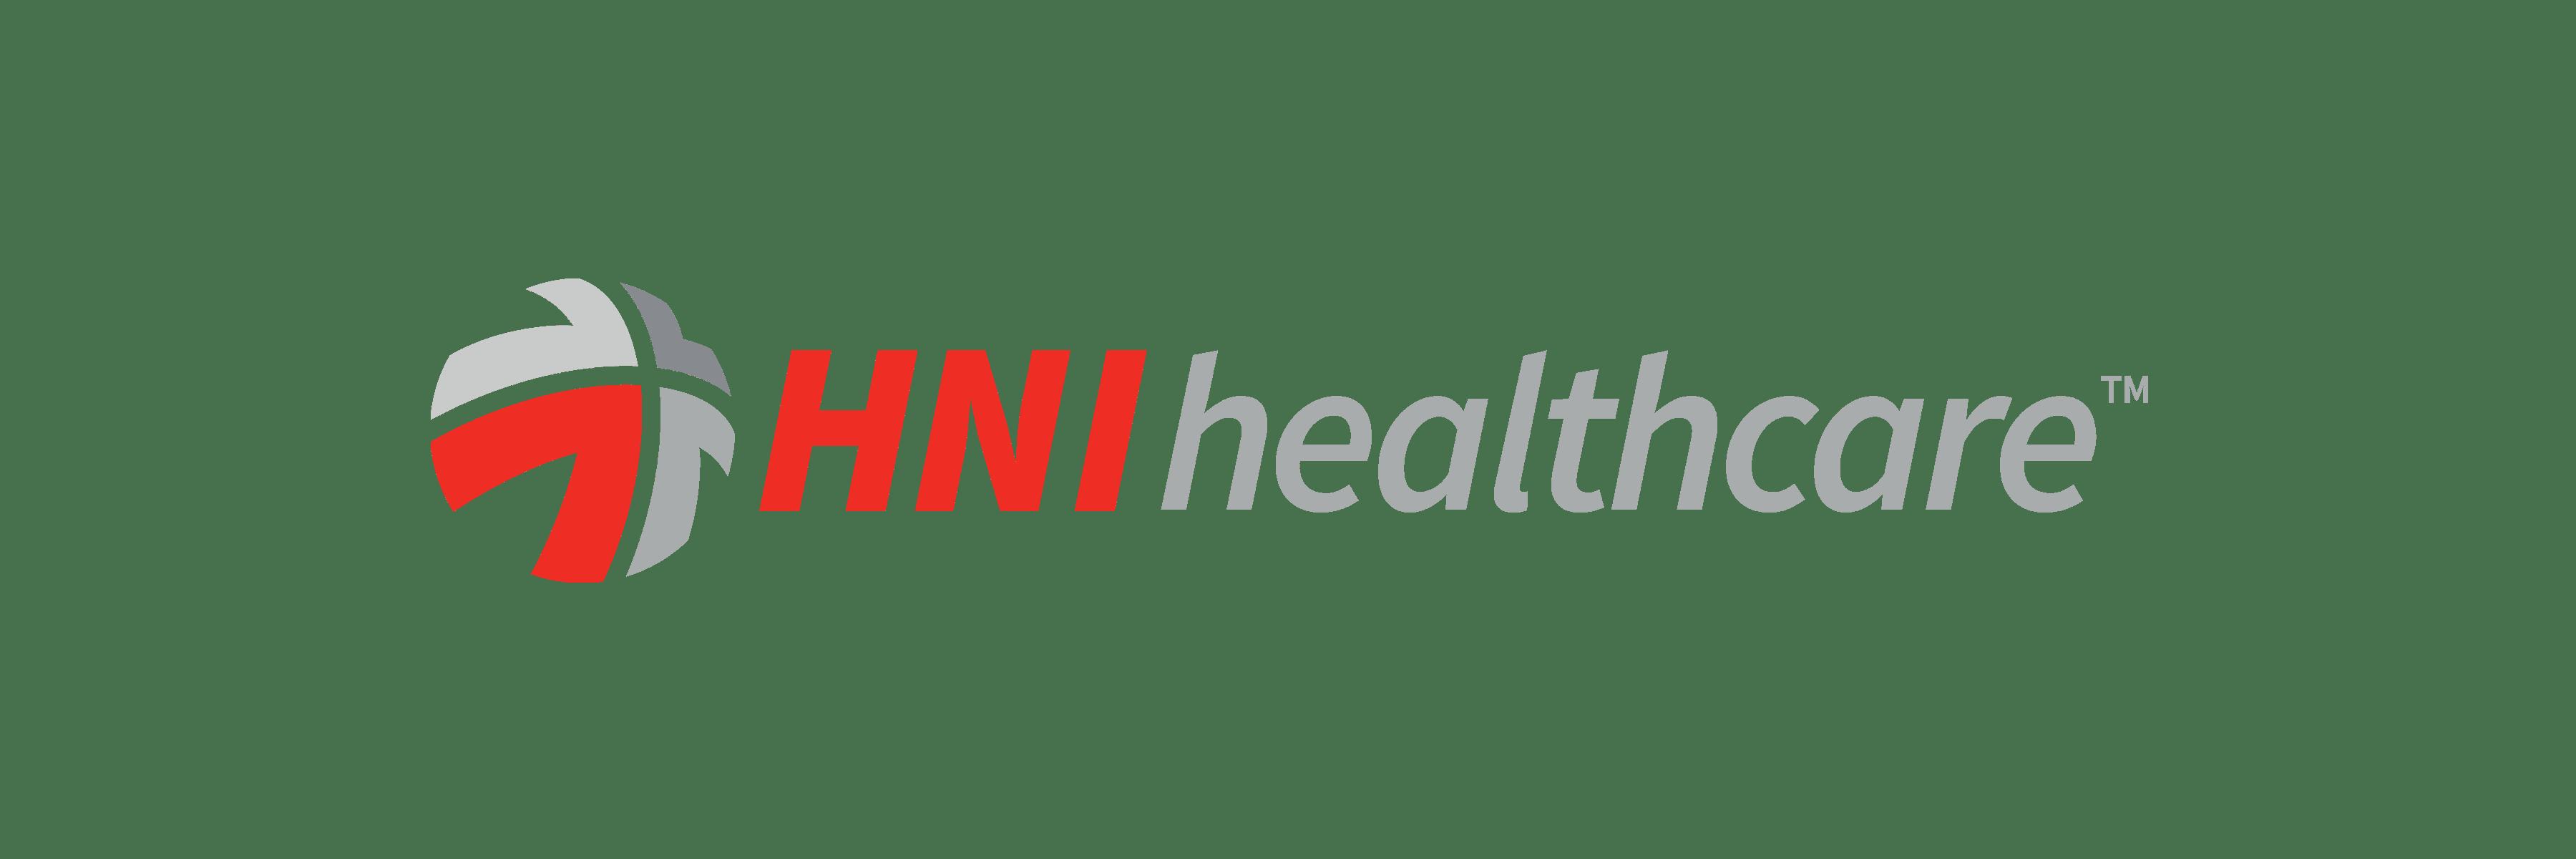 HNI Healthcare company logo